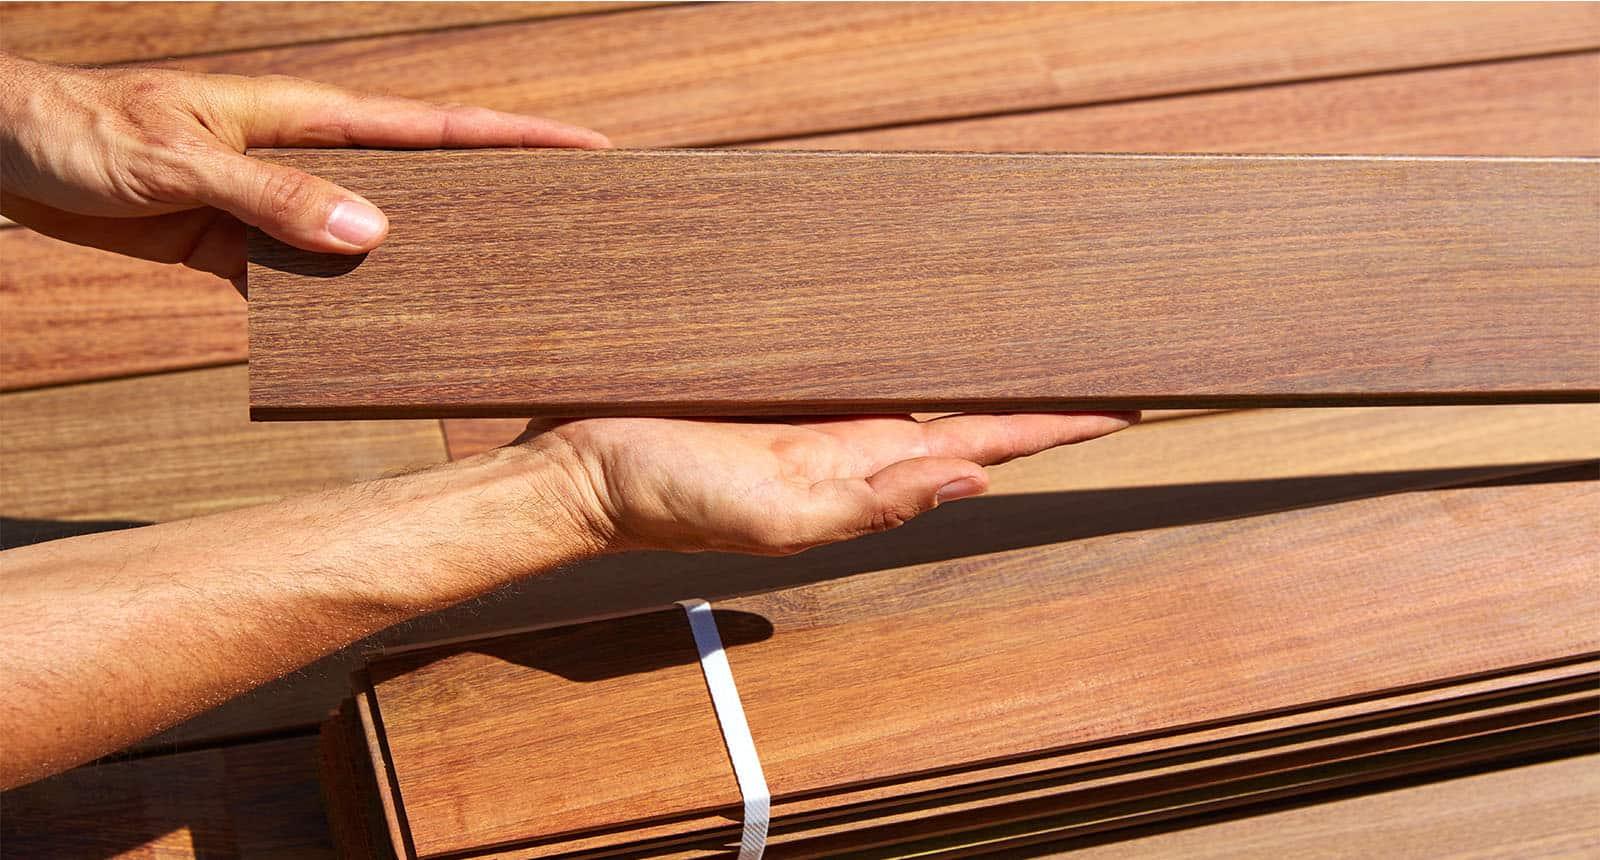 Installation Carpenter Hands Holding